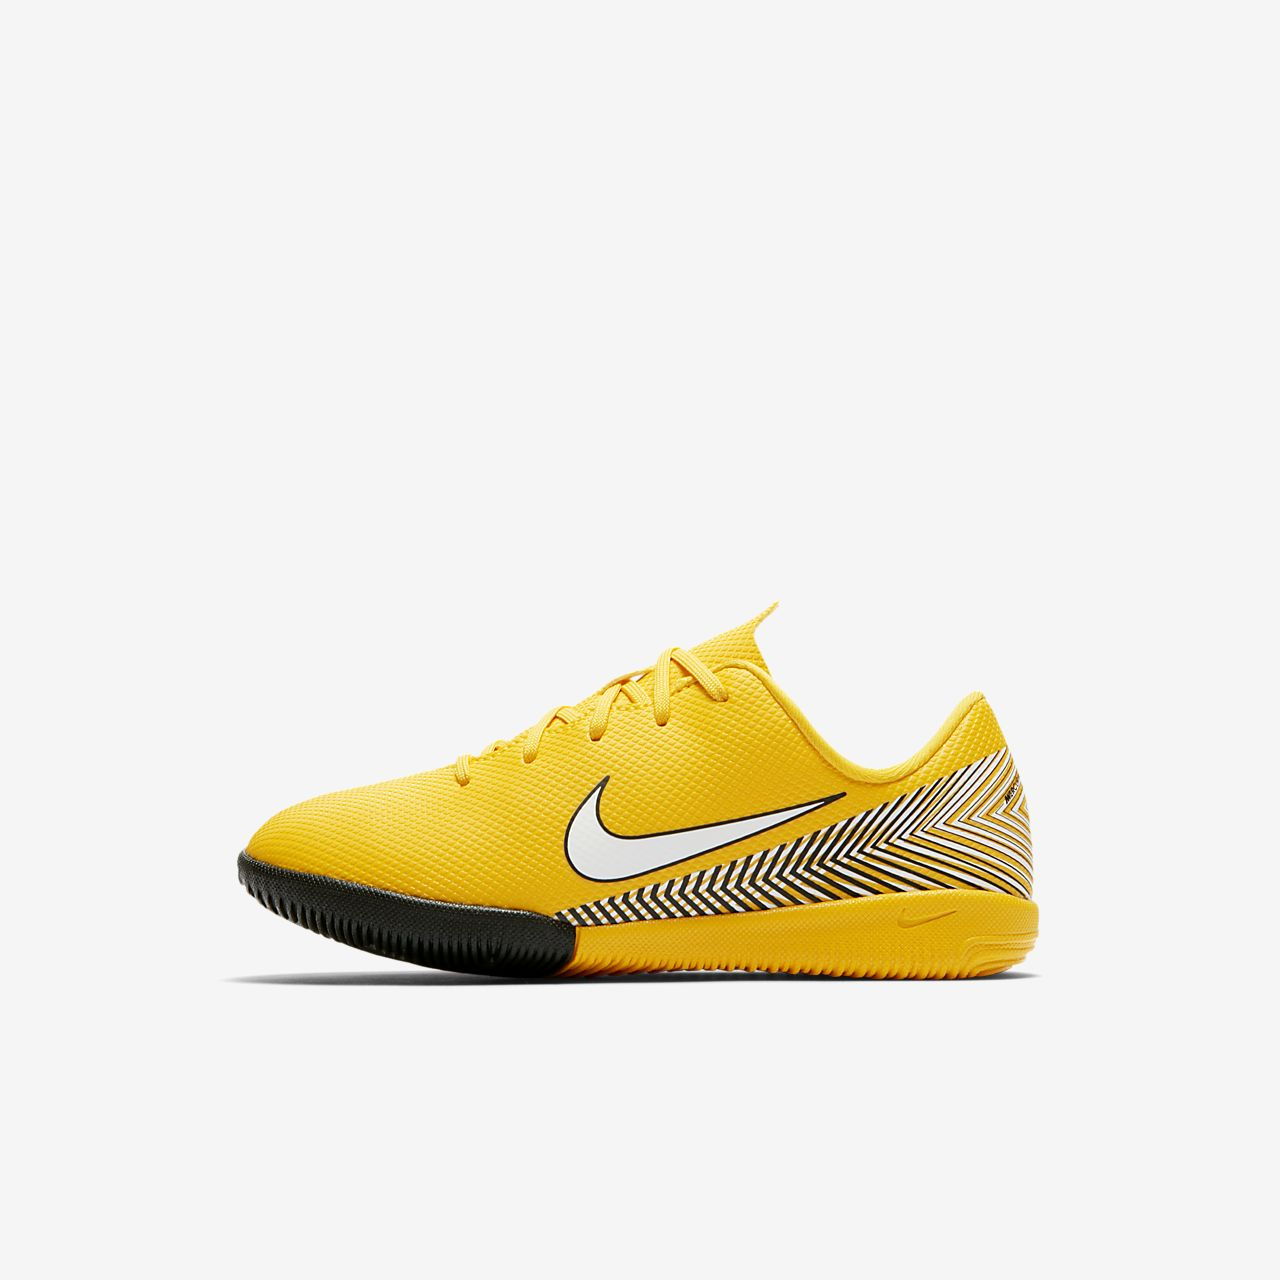 Indoor Vapor Kids' Nike Neymar Xii Mercurial Jr Younger Academy wHWwgqAZT8